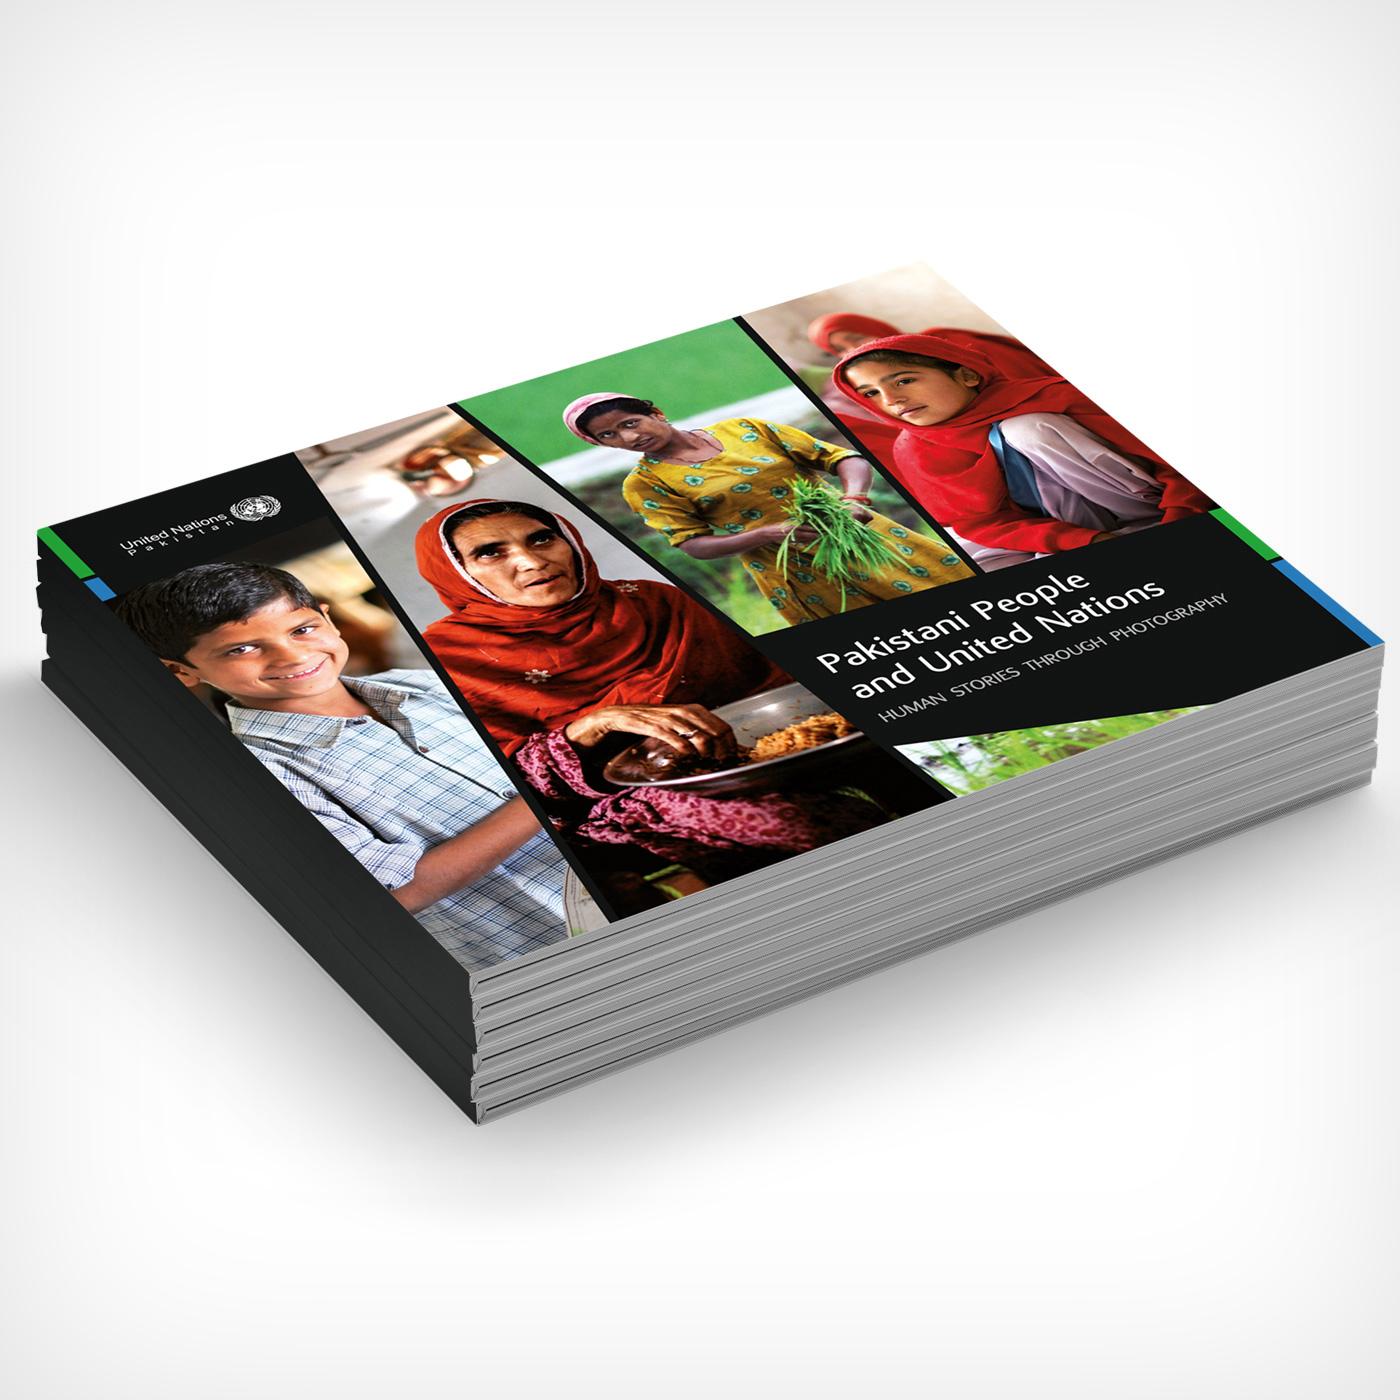 Catalogo mostra Pakistani people and United Nations - Graphic Design Mirko Neri